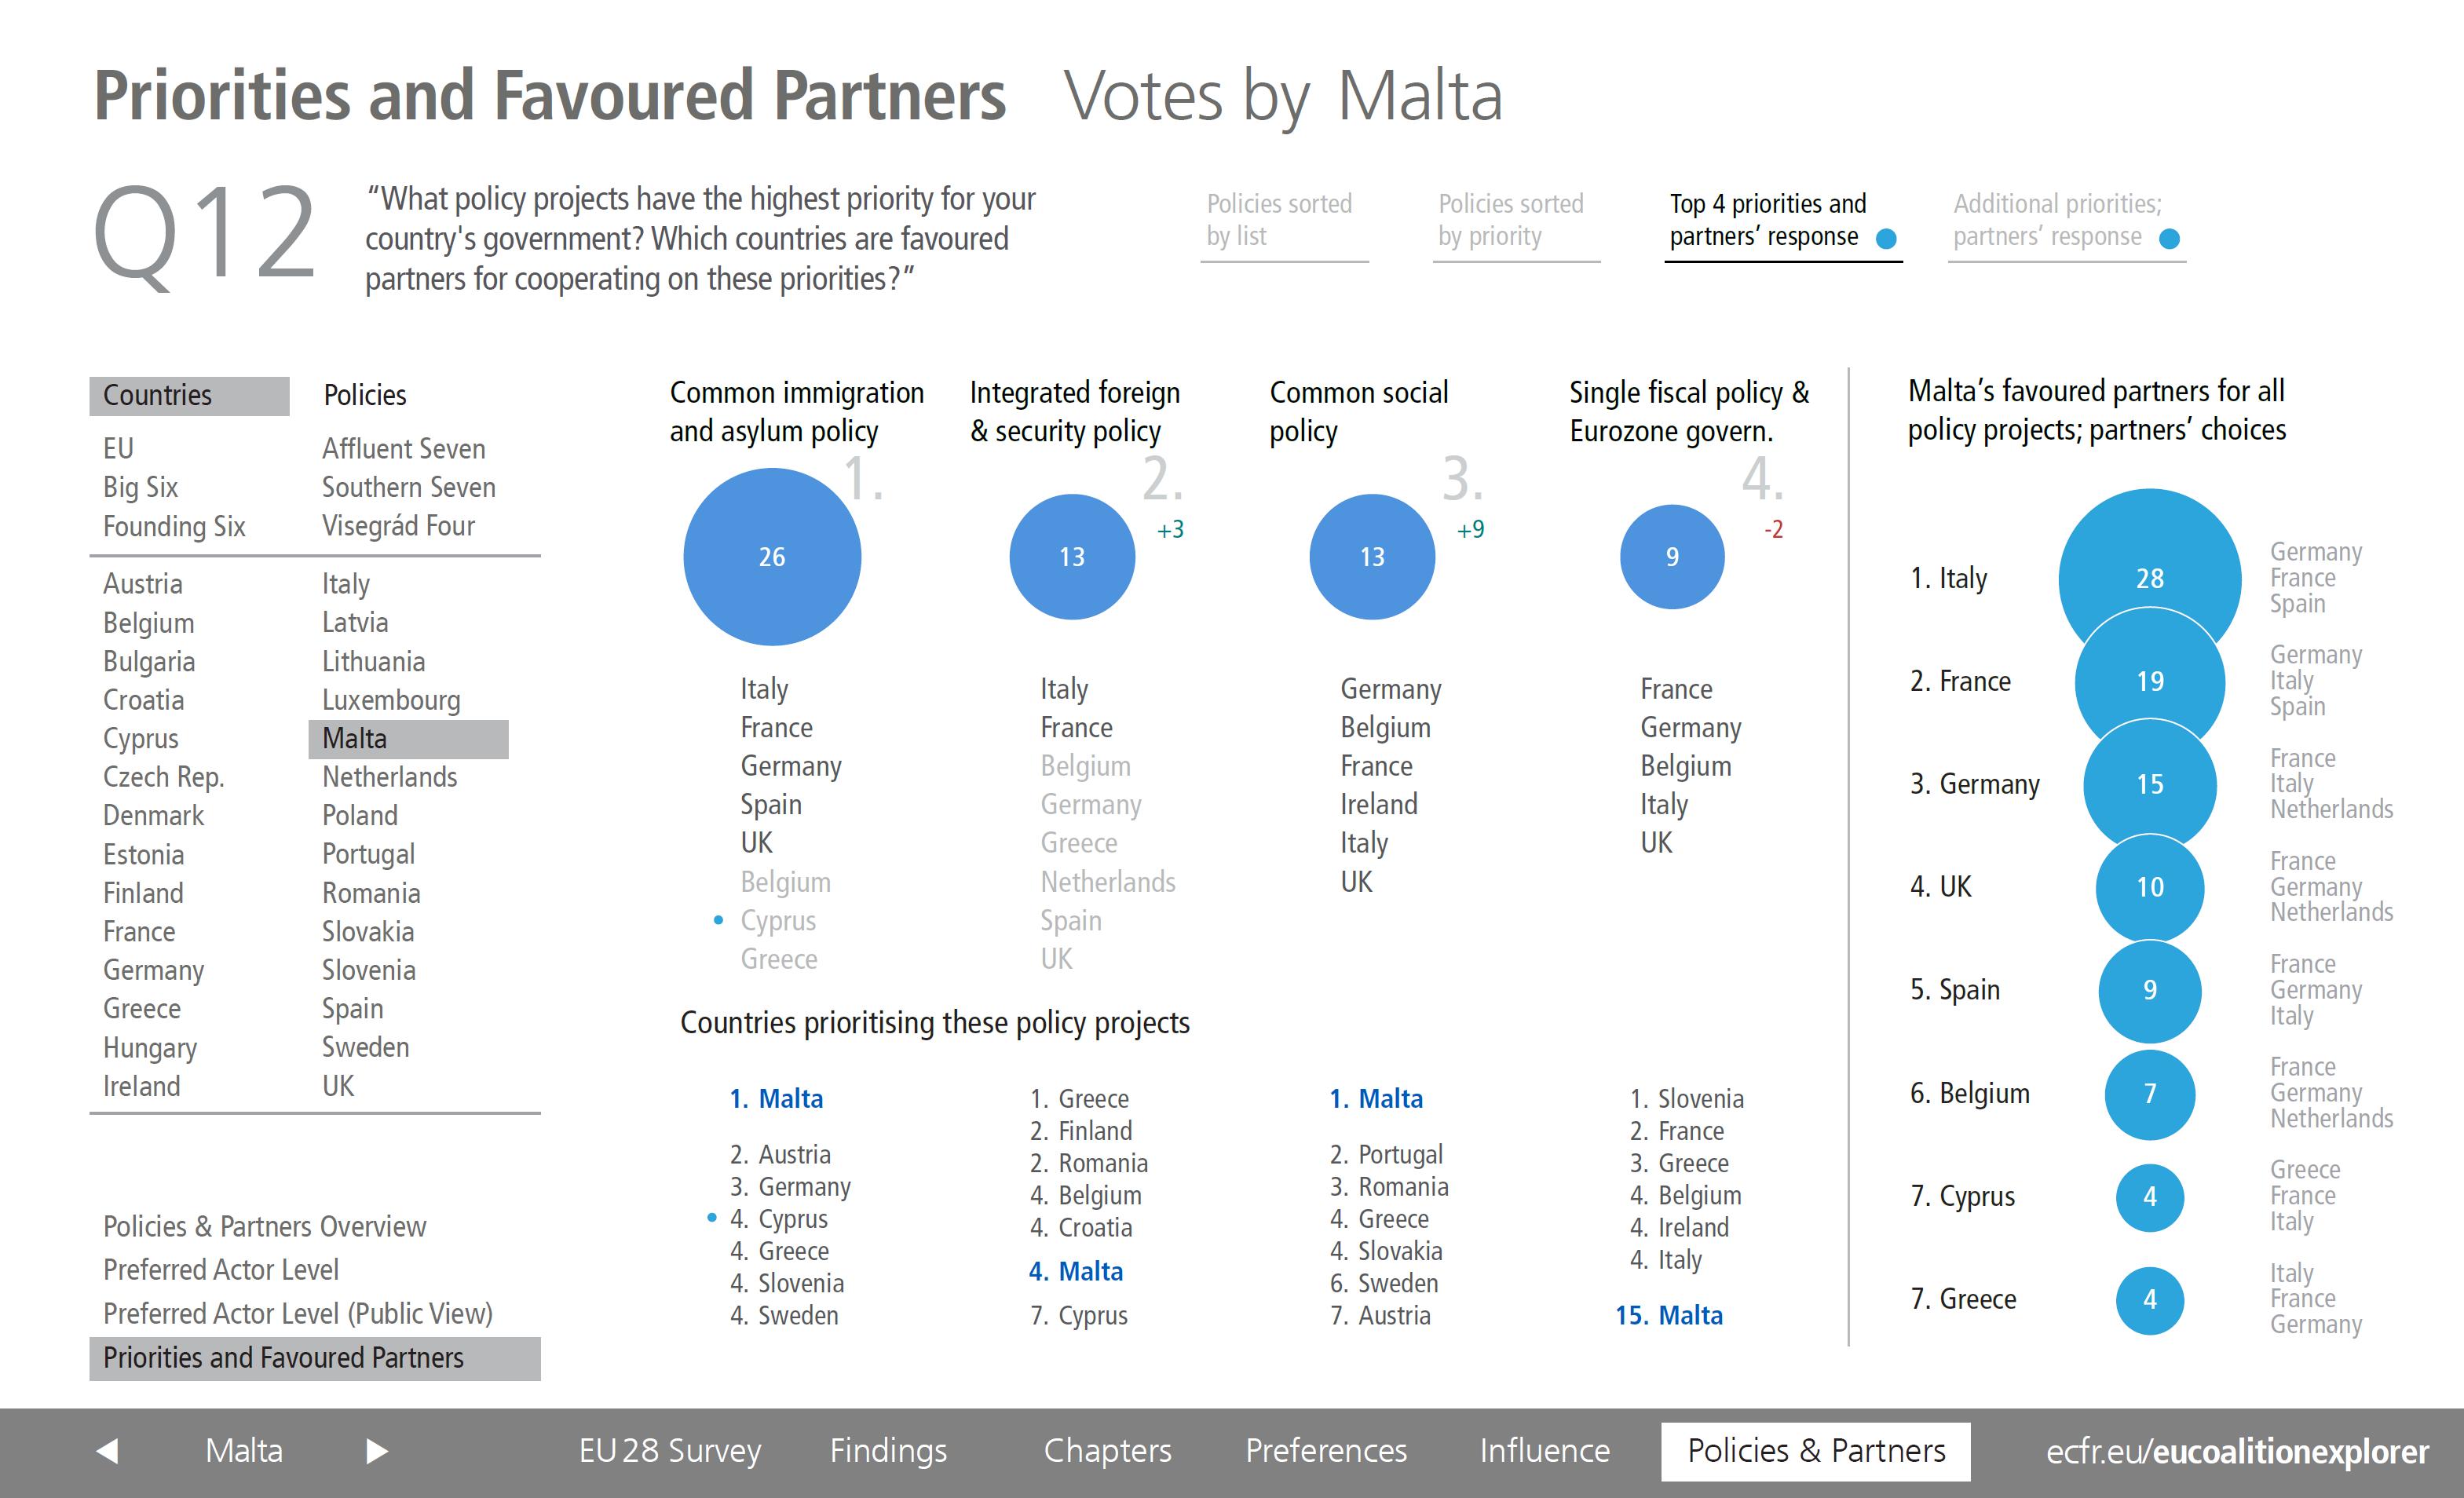 Malta Priorities and Partners ECFR